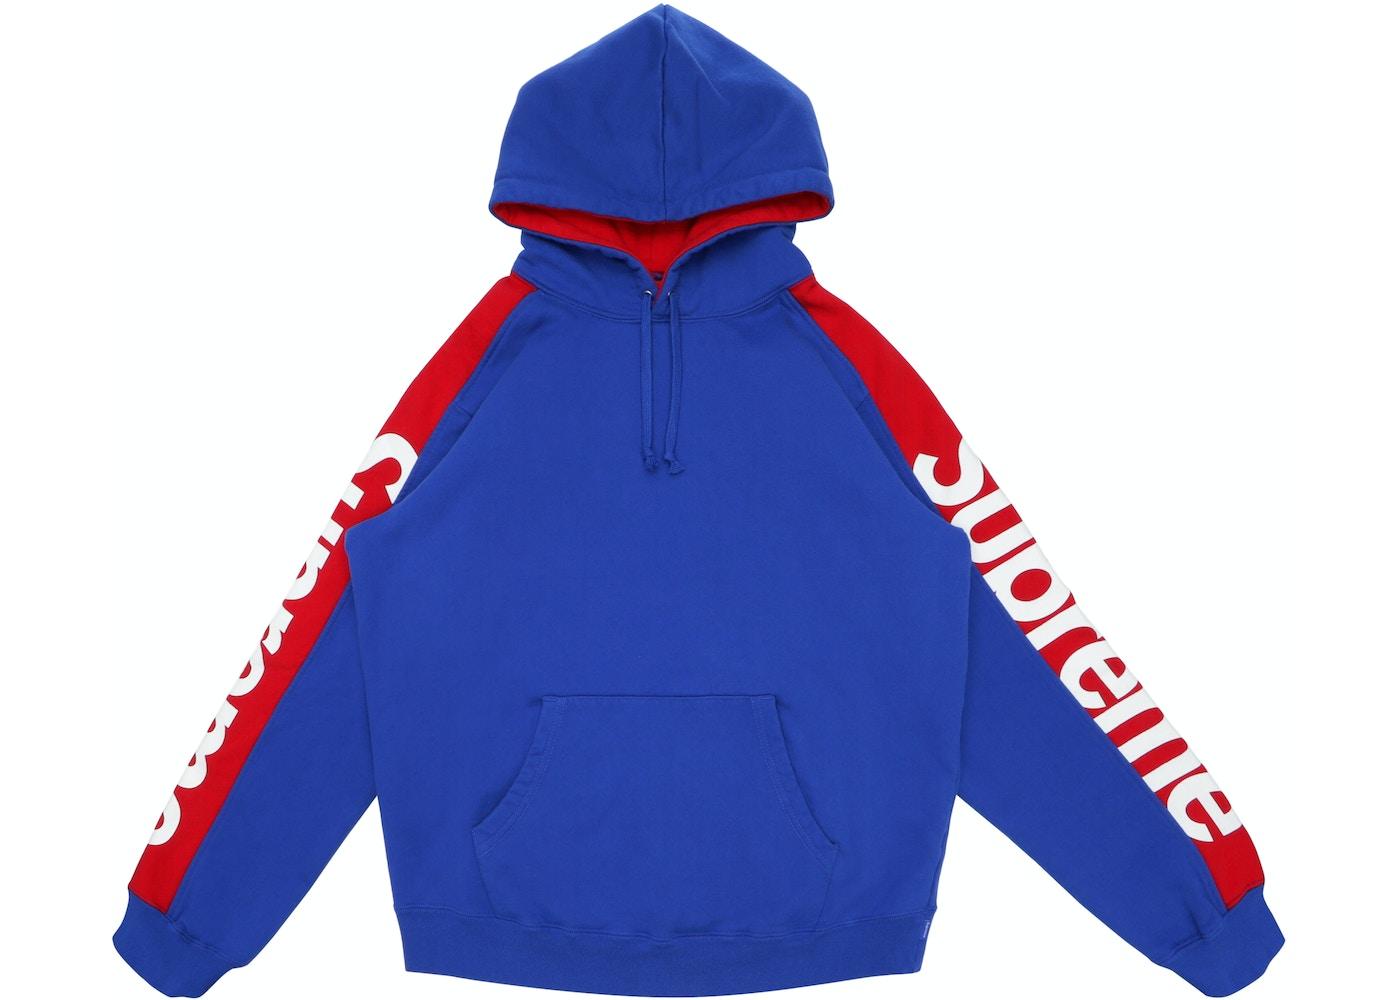 a05ce9e8 Supreme Sideline Hooded Sweatshirt Royal - SS18